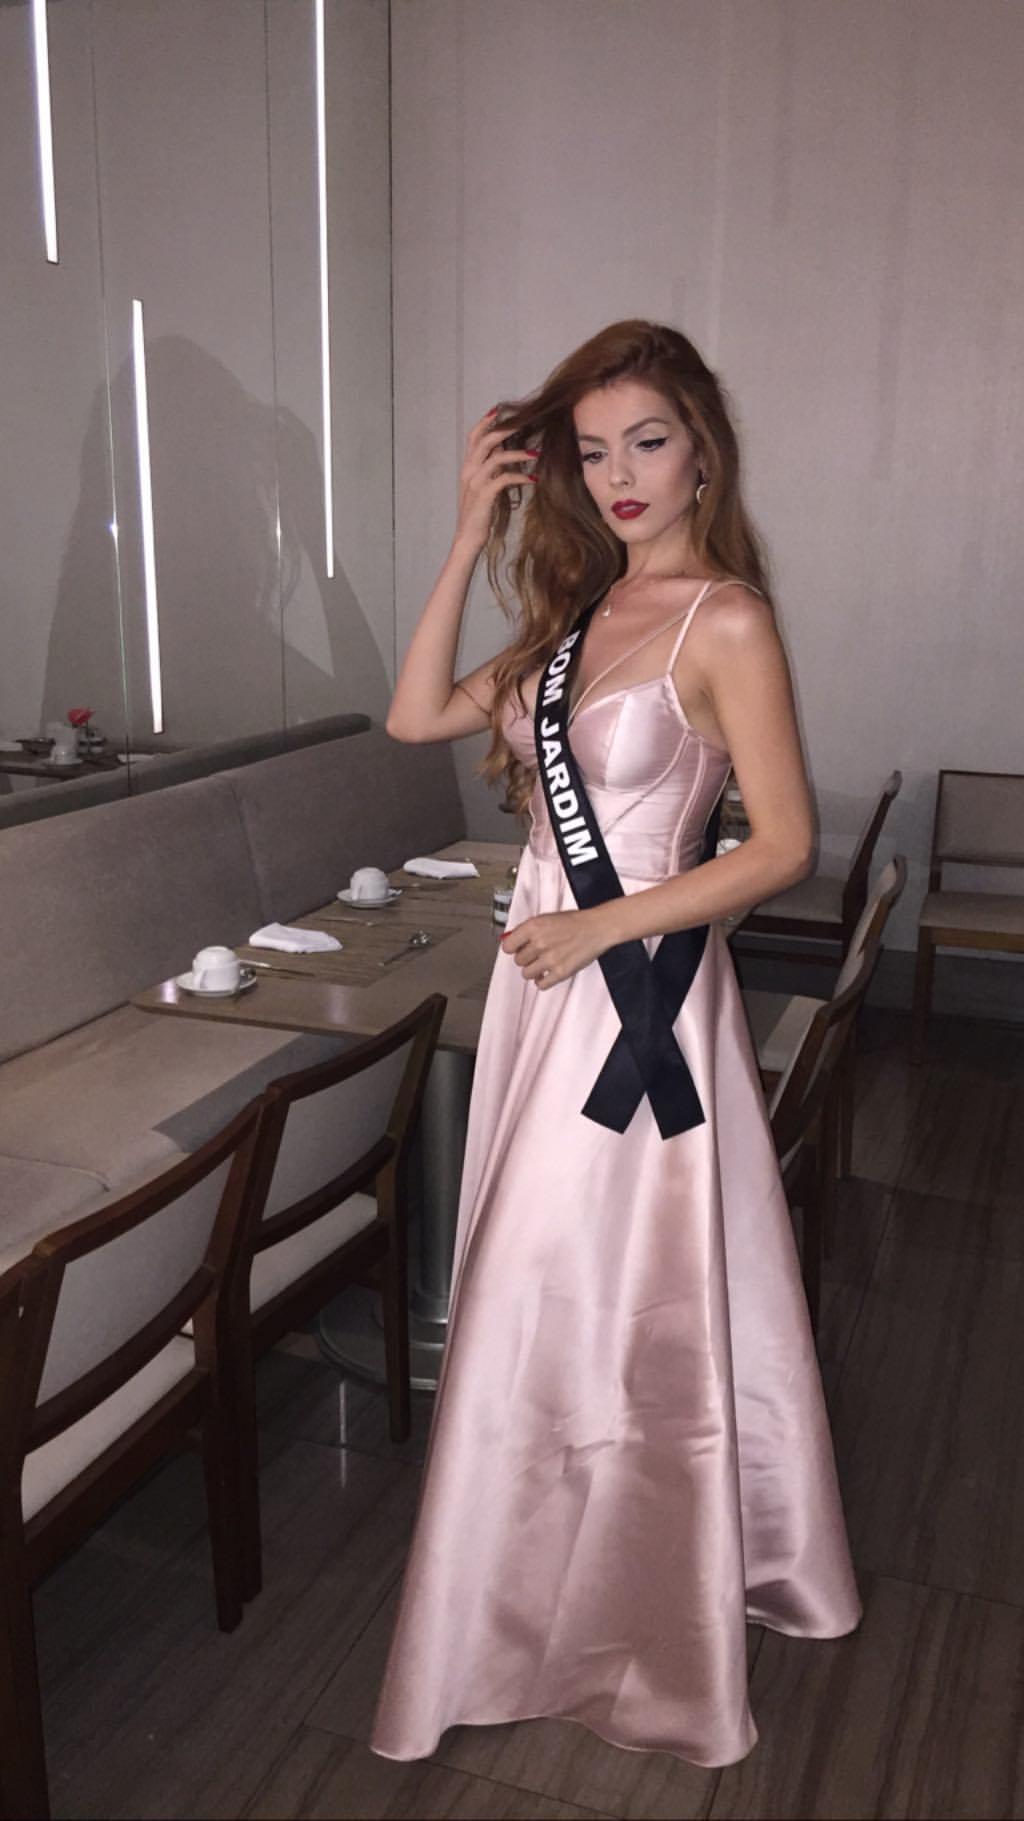 nathalie de oliveira, miss bom jardim 2019/1st runner-up de miss international queen 2016. - Página 9 50811310